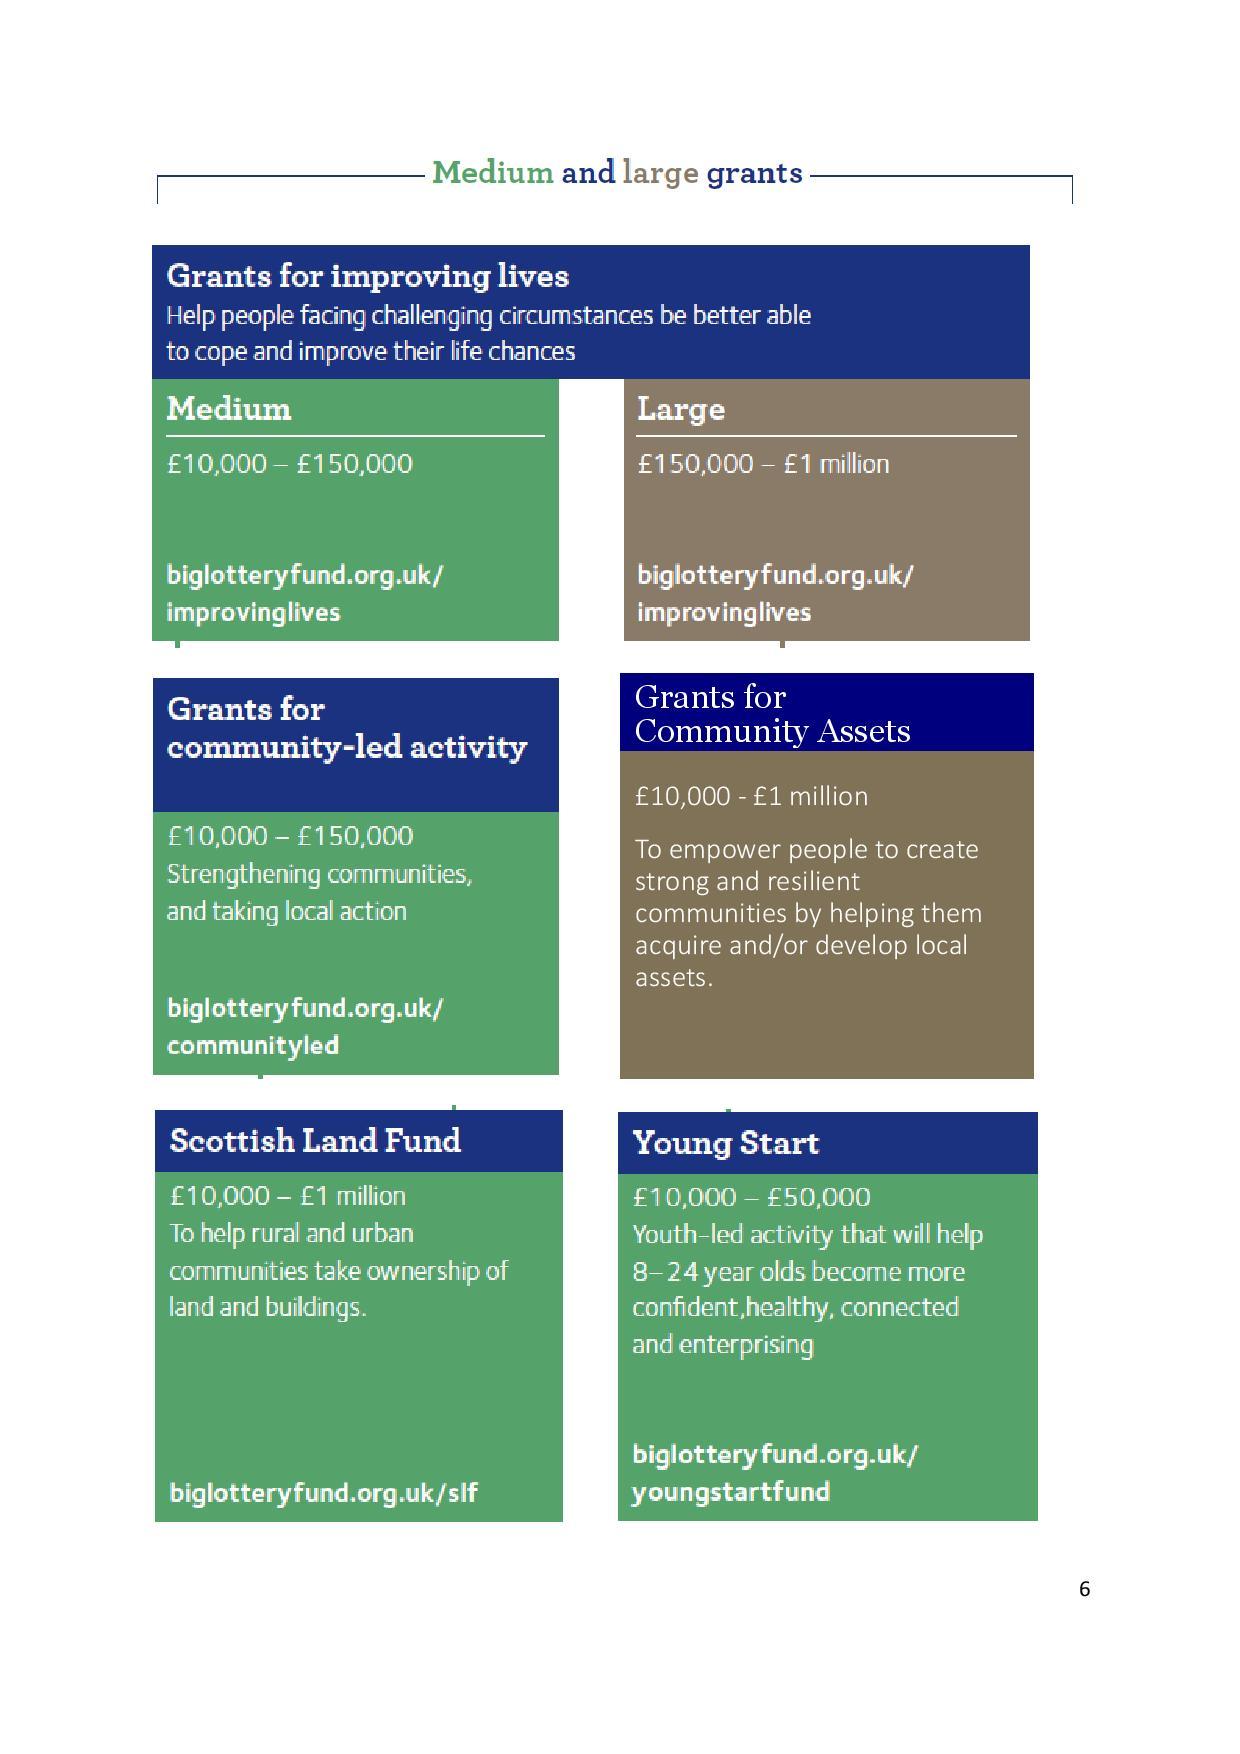 Big_Lottery_Fund_Scotland_Information_Briefing-page-006.jpg